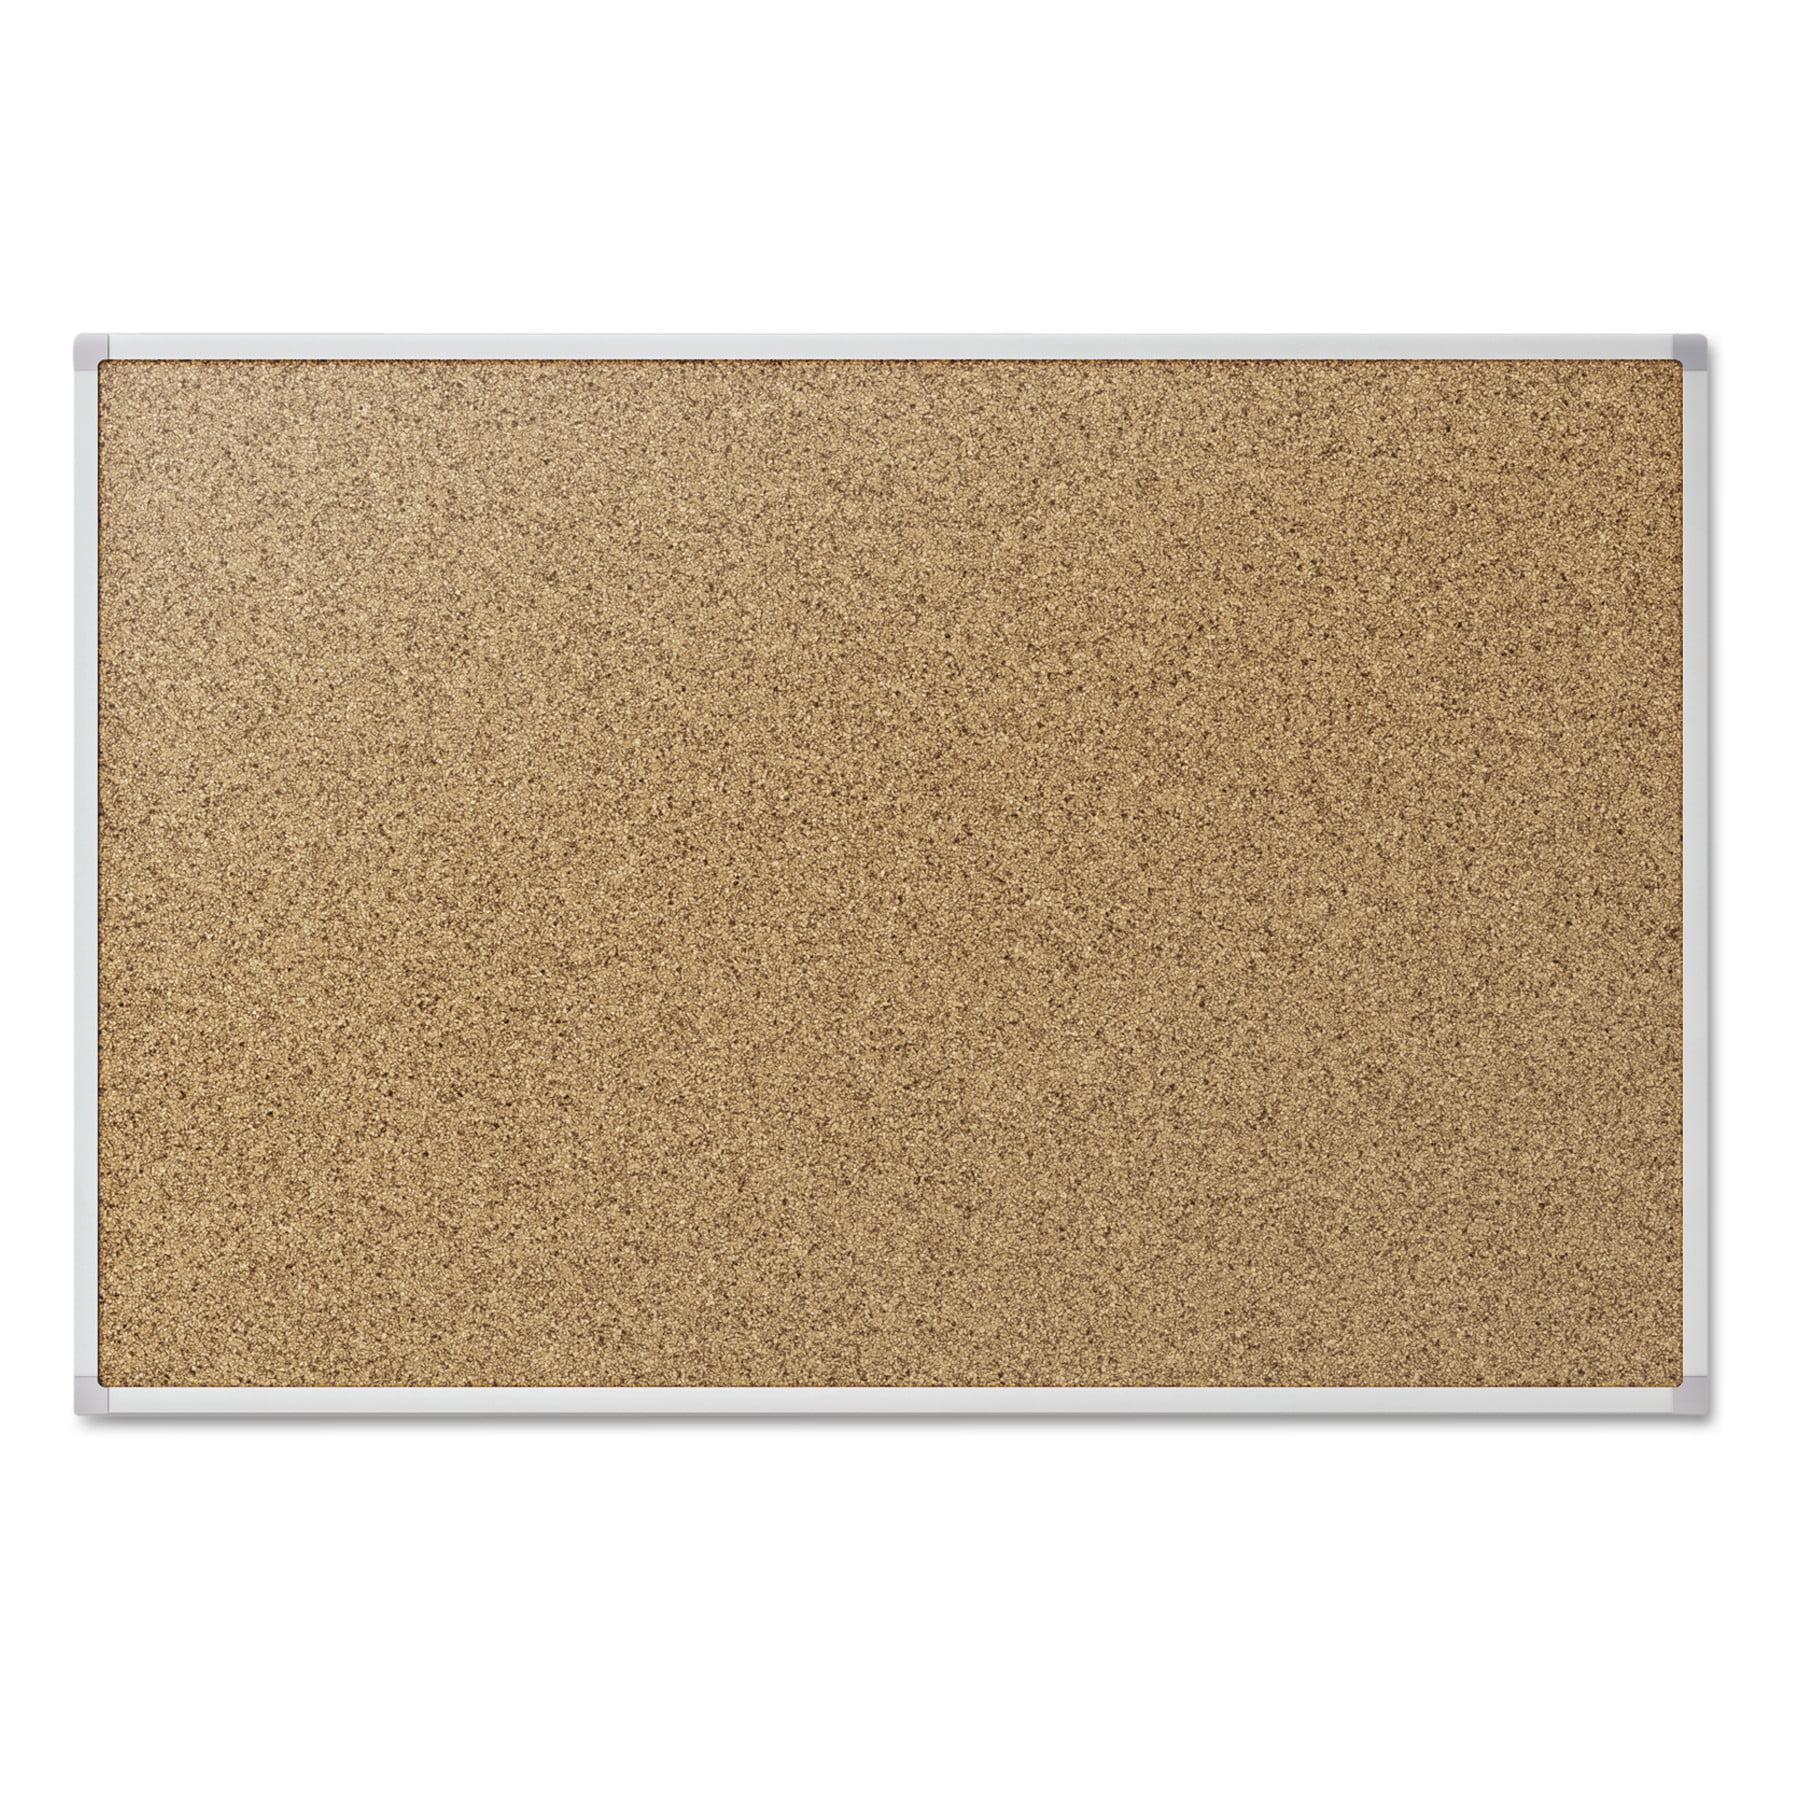 "Mead Cork Bulletin Board, Silver Aluminum Frame, 48"" x 36"